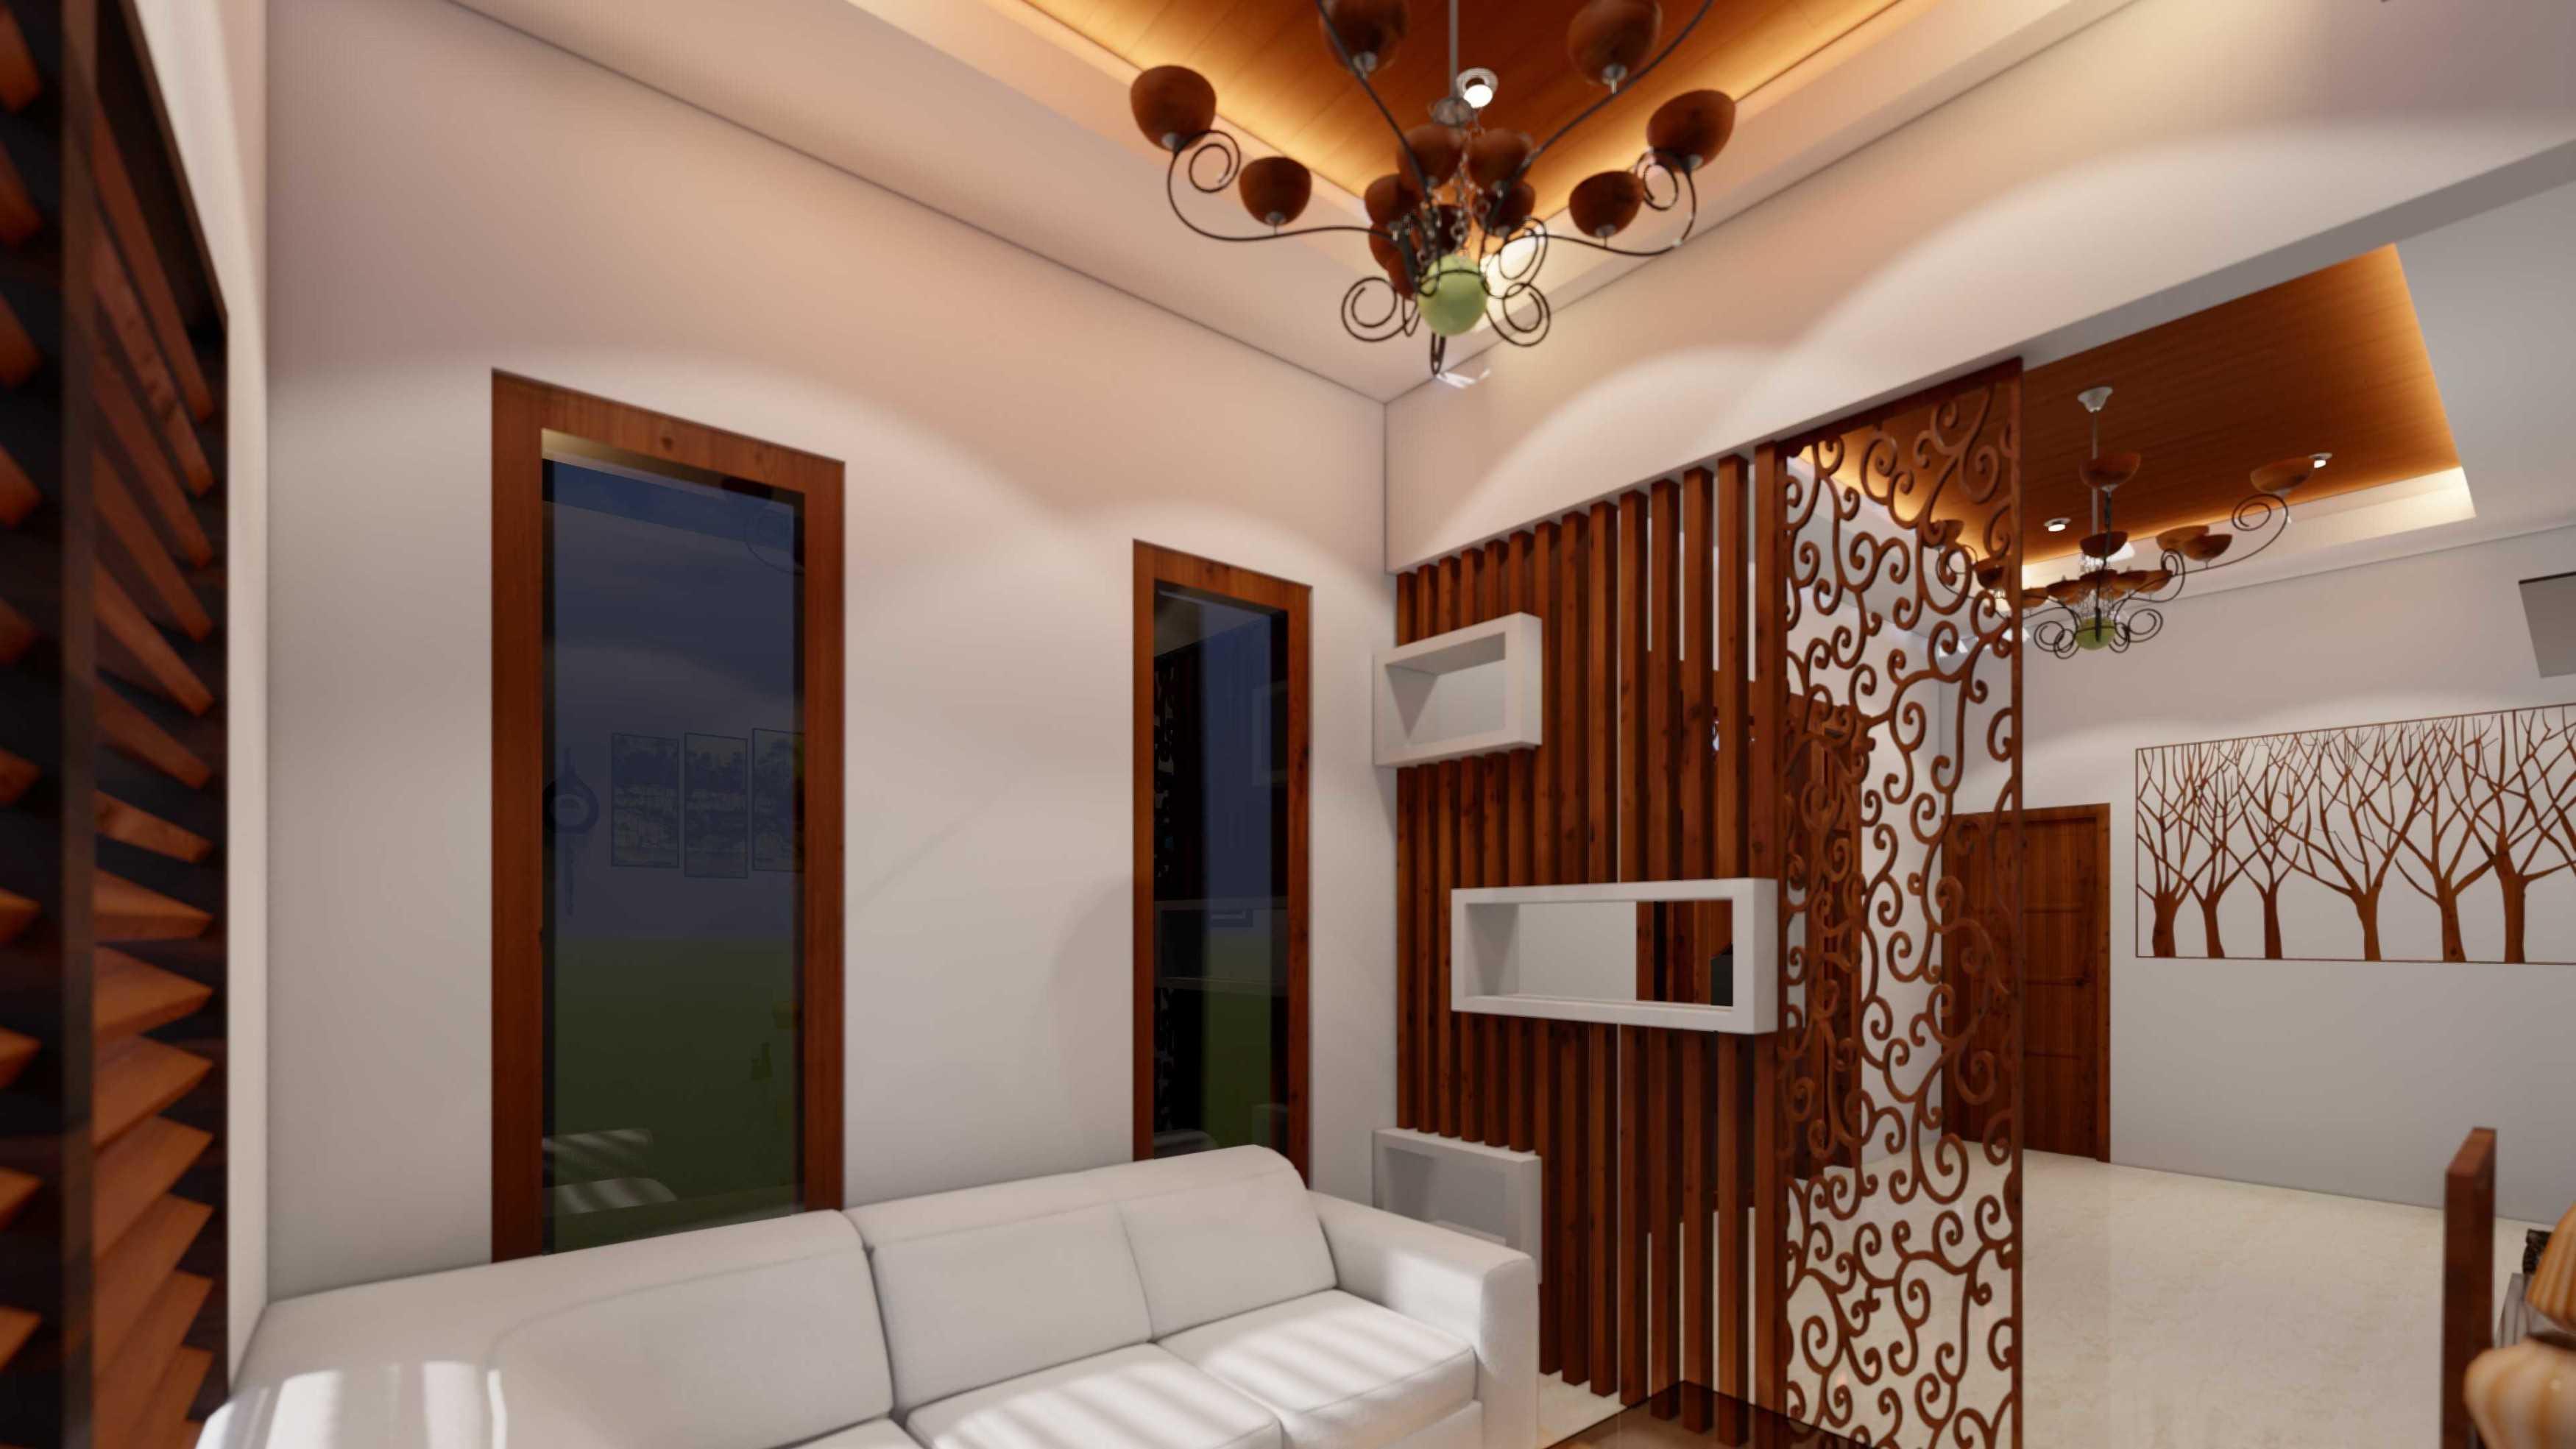 "Kenali's Studio ""chronicles Of Joglo"" A - House Salatiga, Kota Salatiga, Jawa Tengah, Indonesia Salatiga, Kota Salatiga, Jawa Tengah, Indonesia Kenalis-Studio-Chronicles-Of-Joglo-A-House   101862"